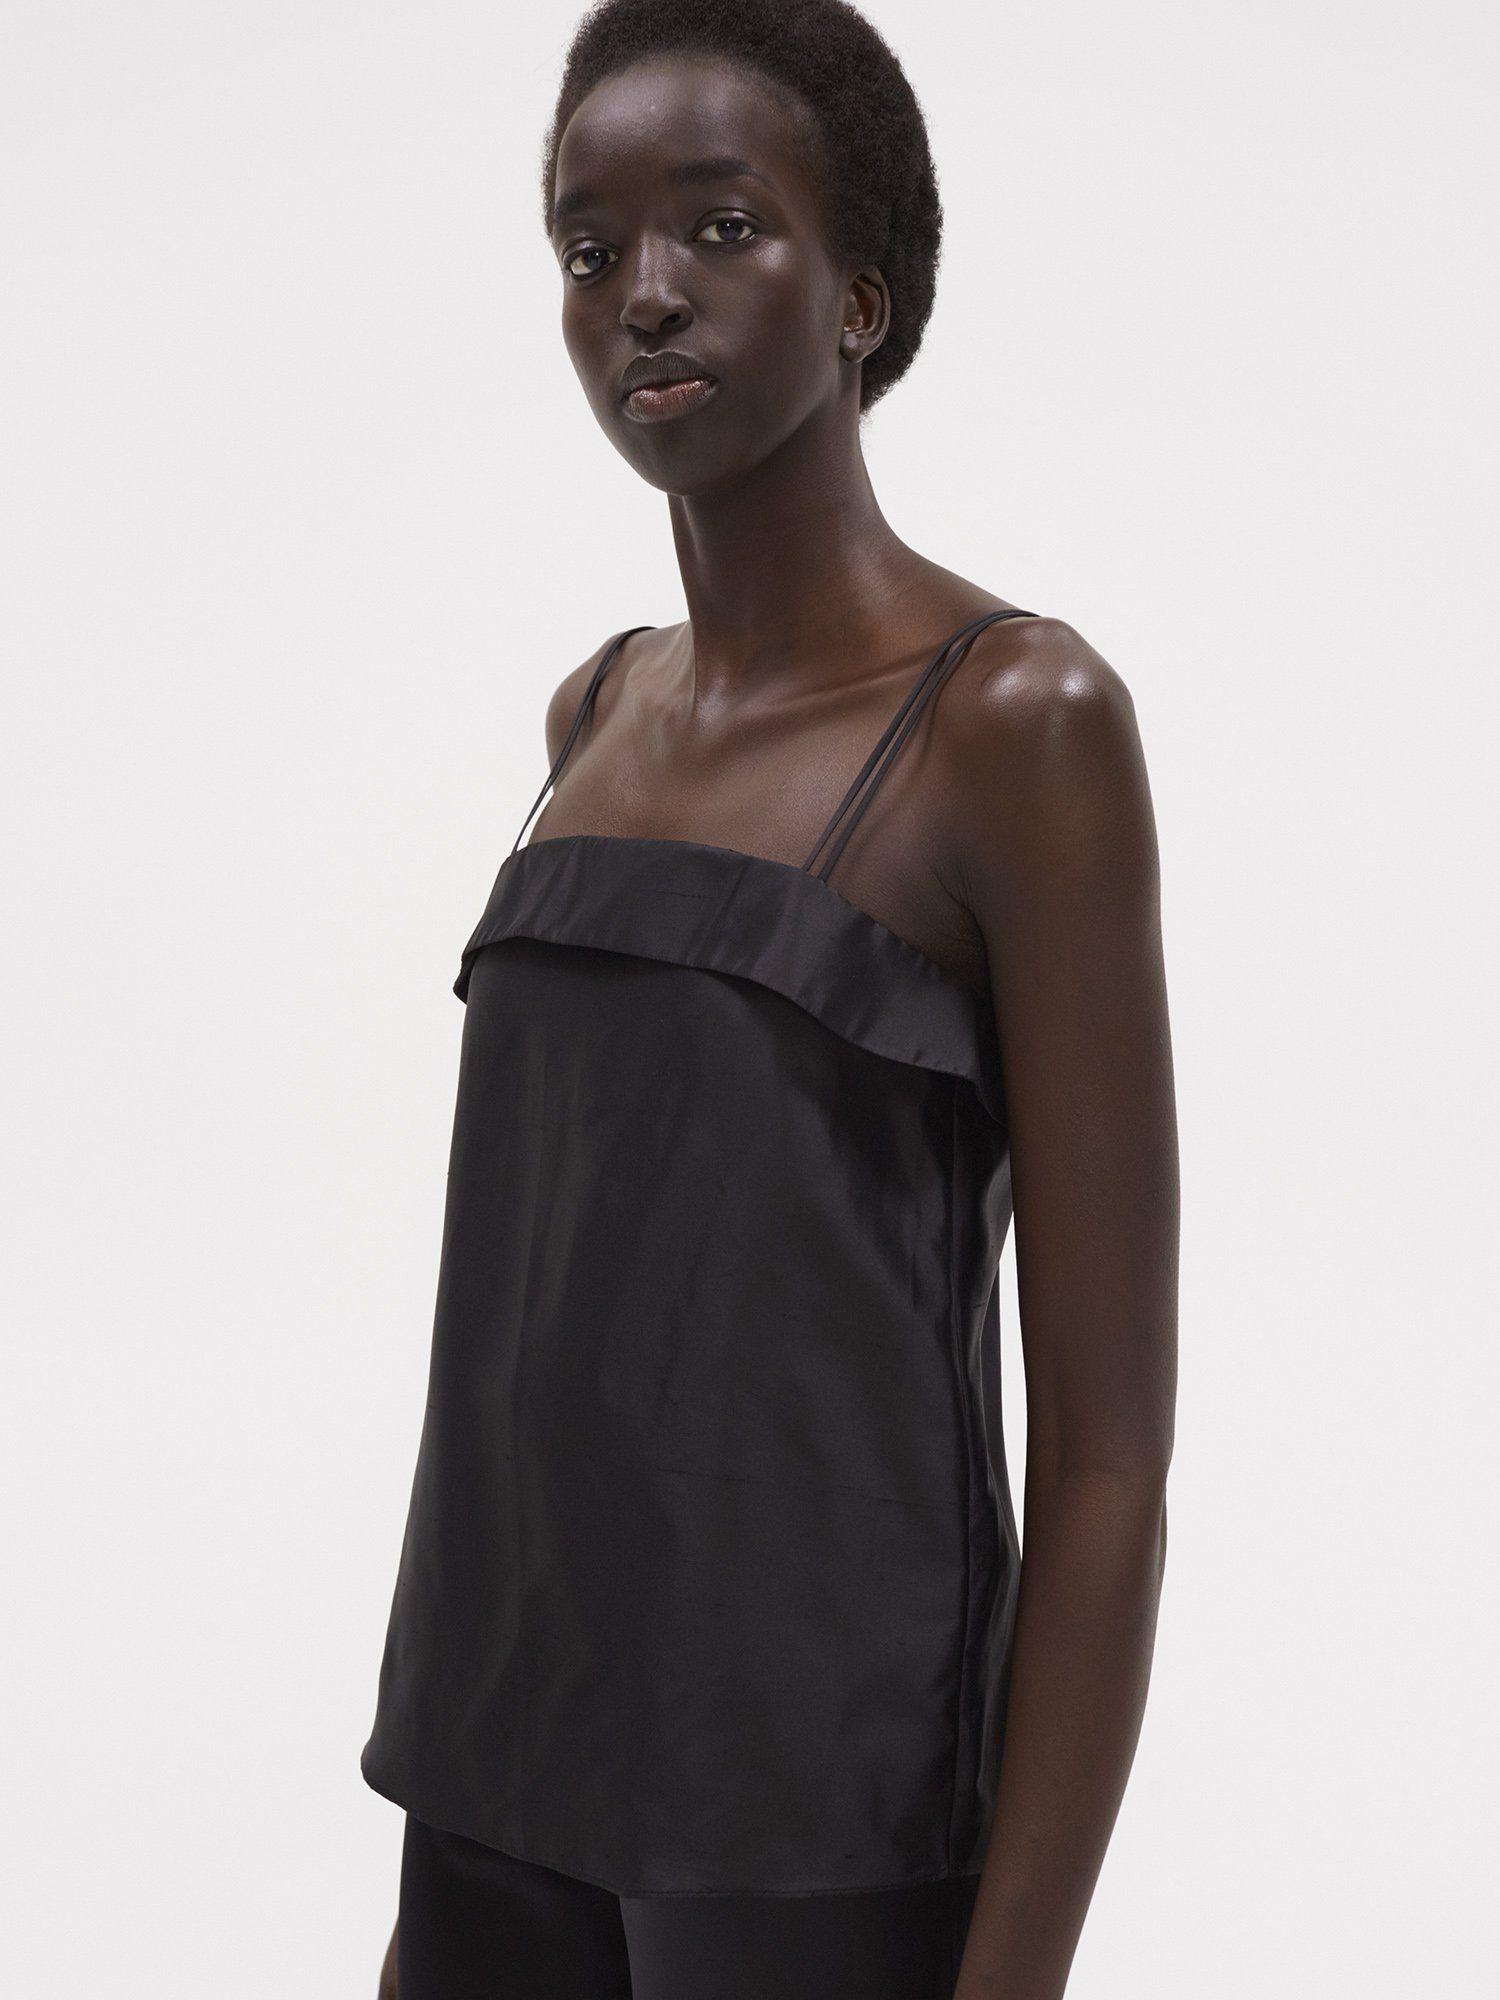 Meghan Markle Dress